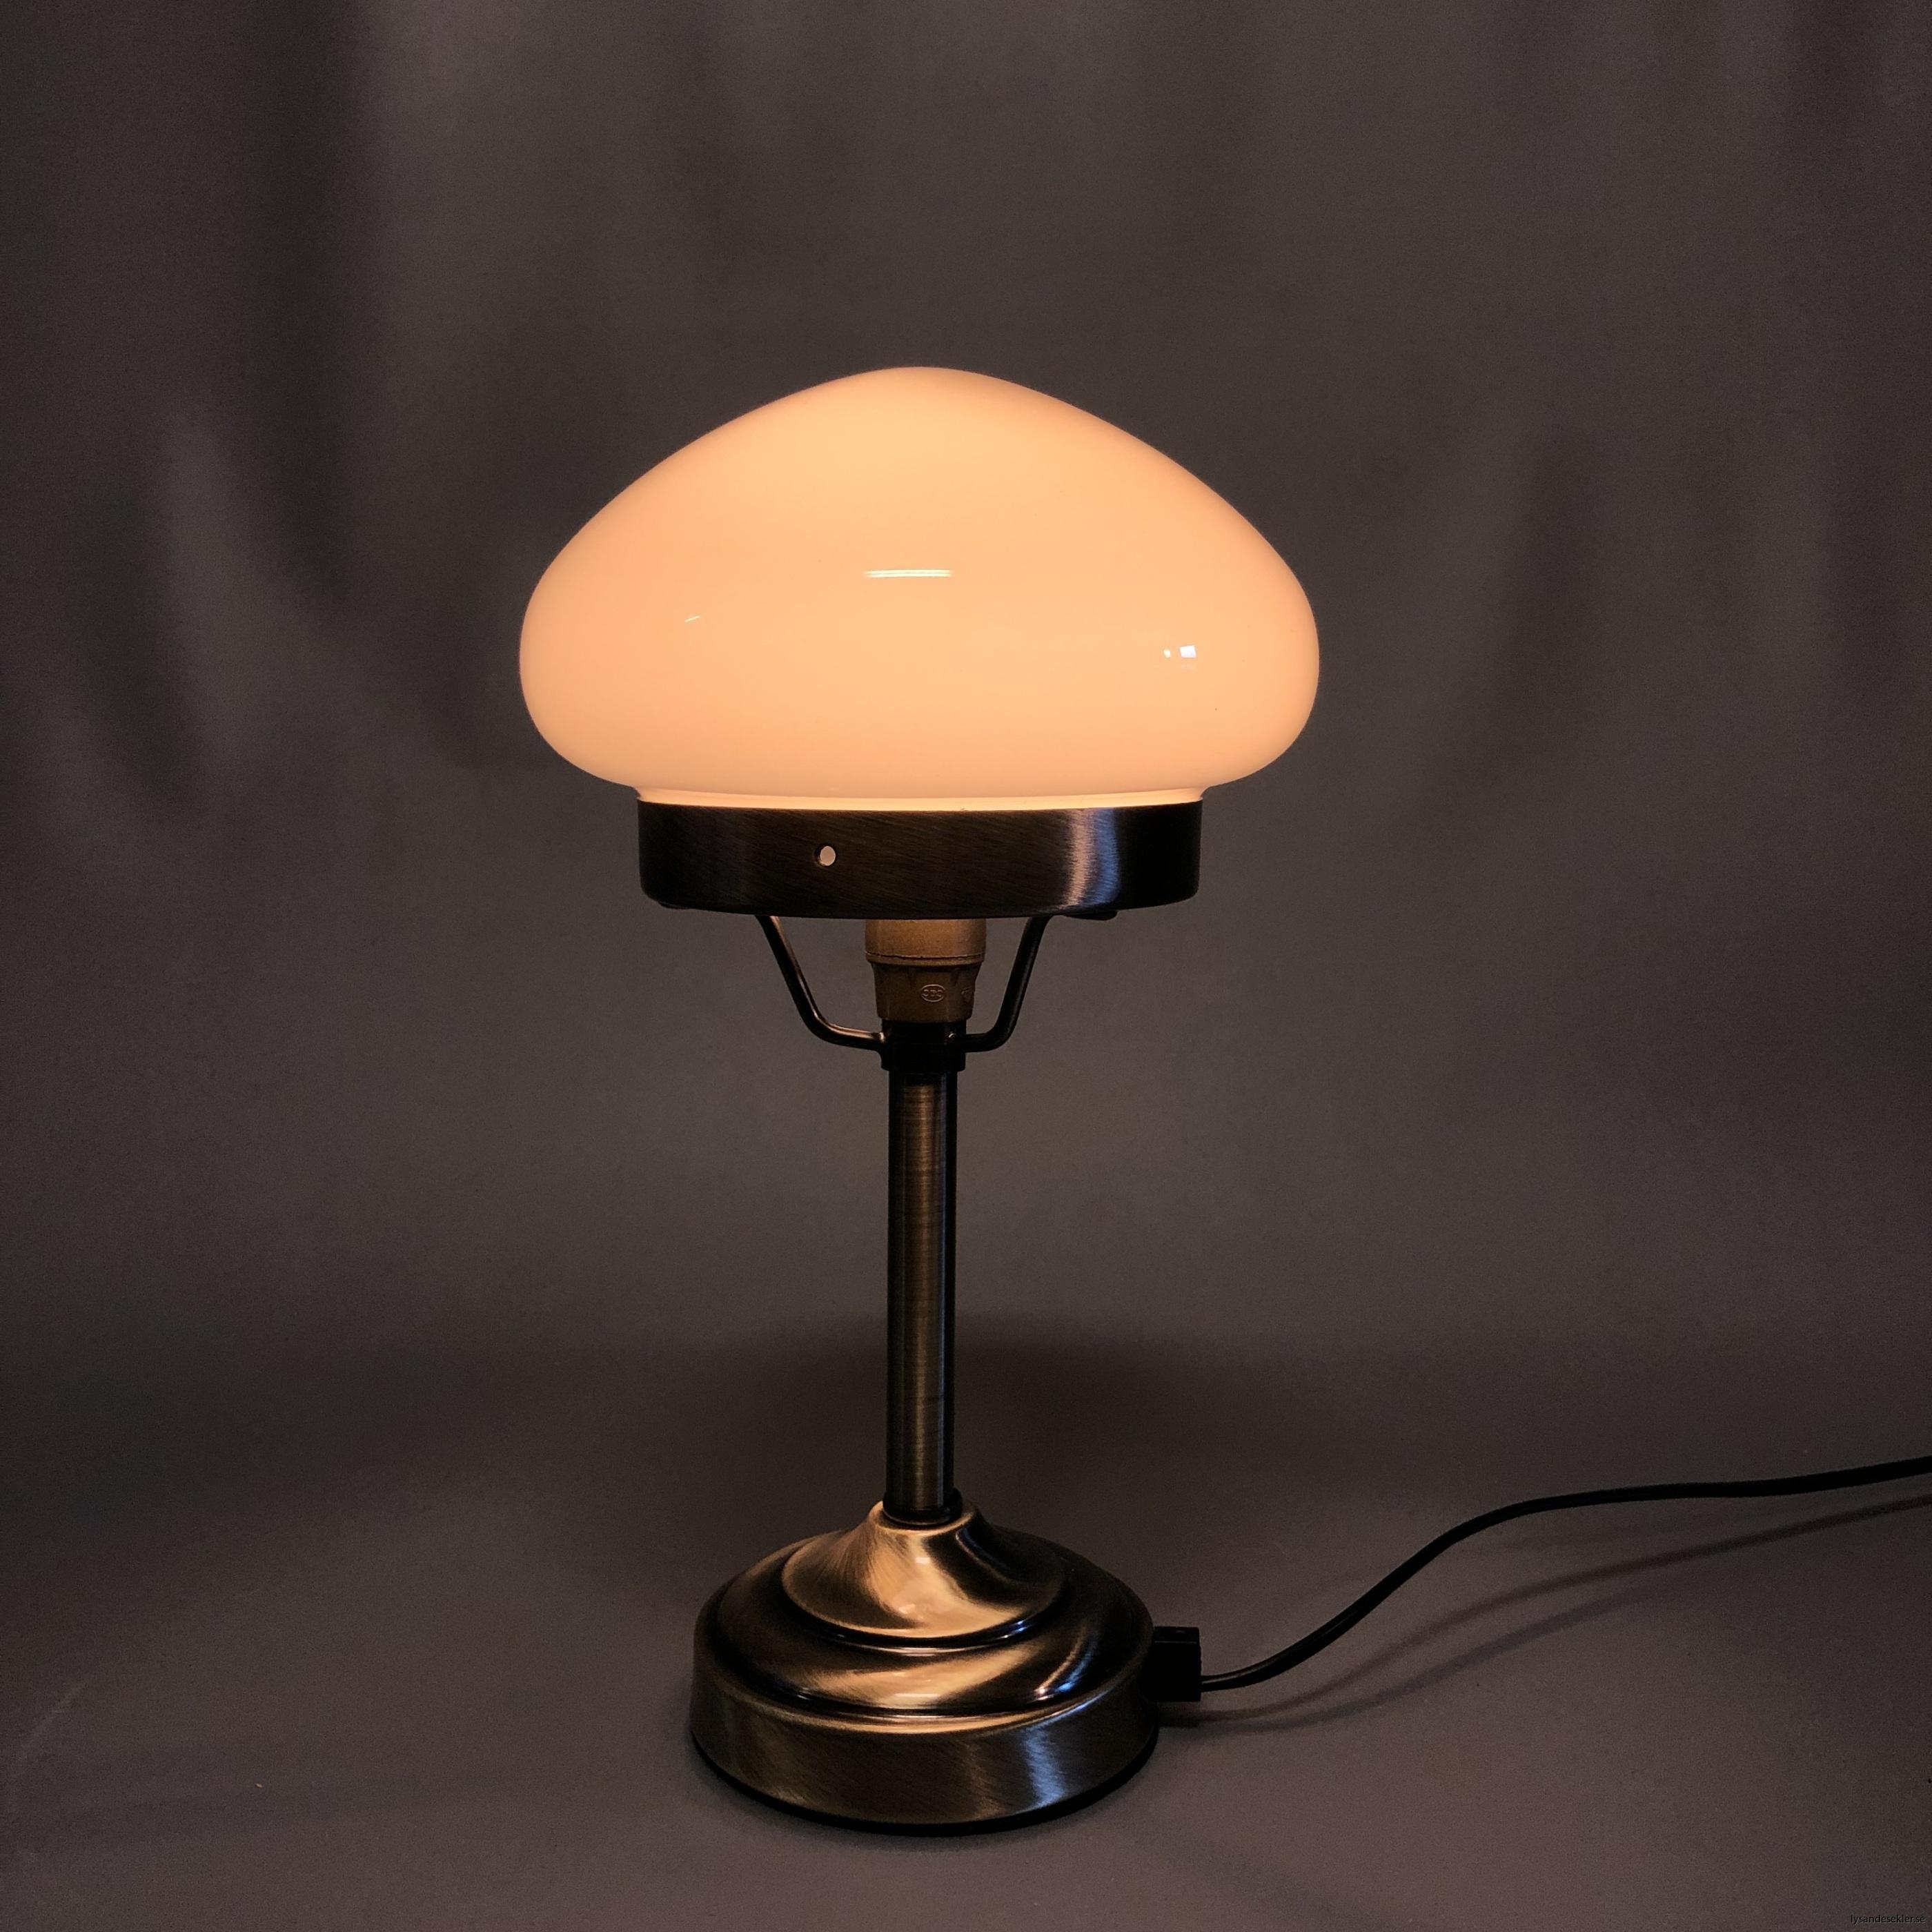 liten strindbergslampa 12 cm skärm1